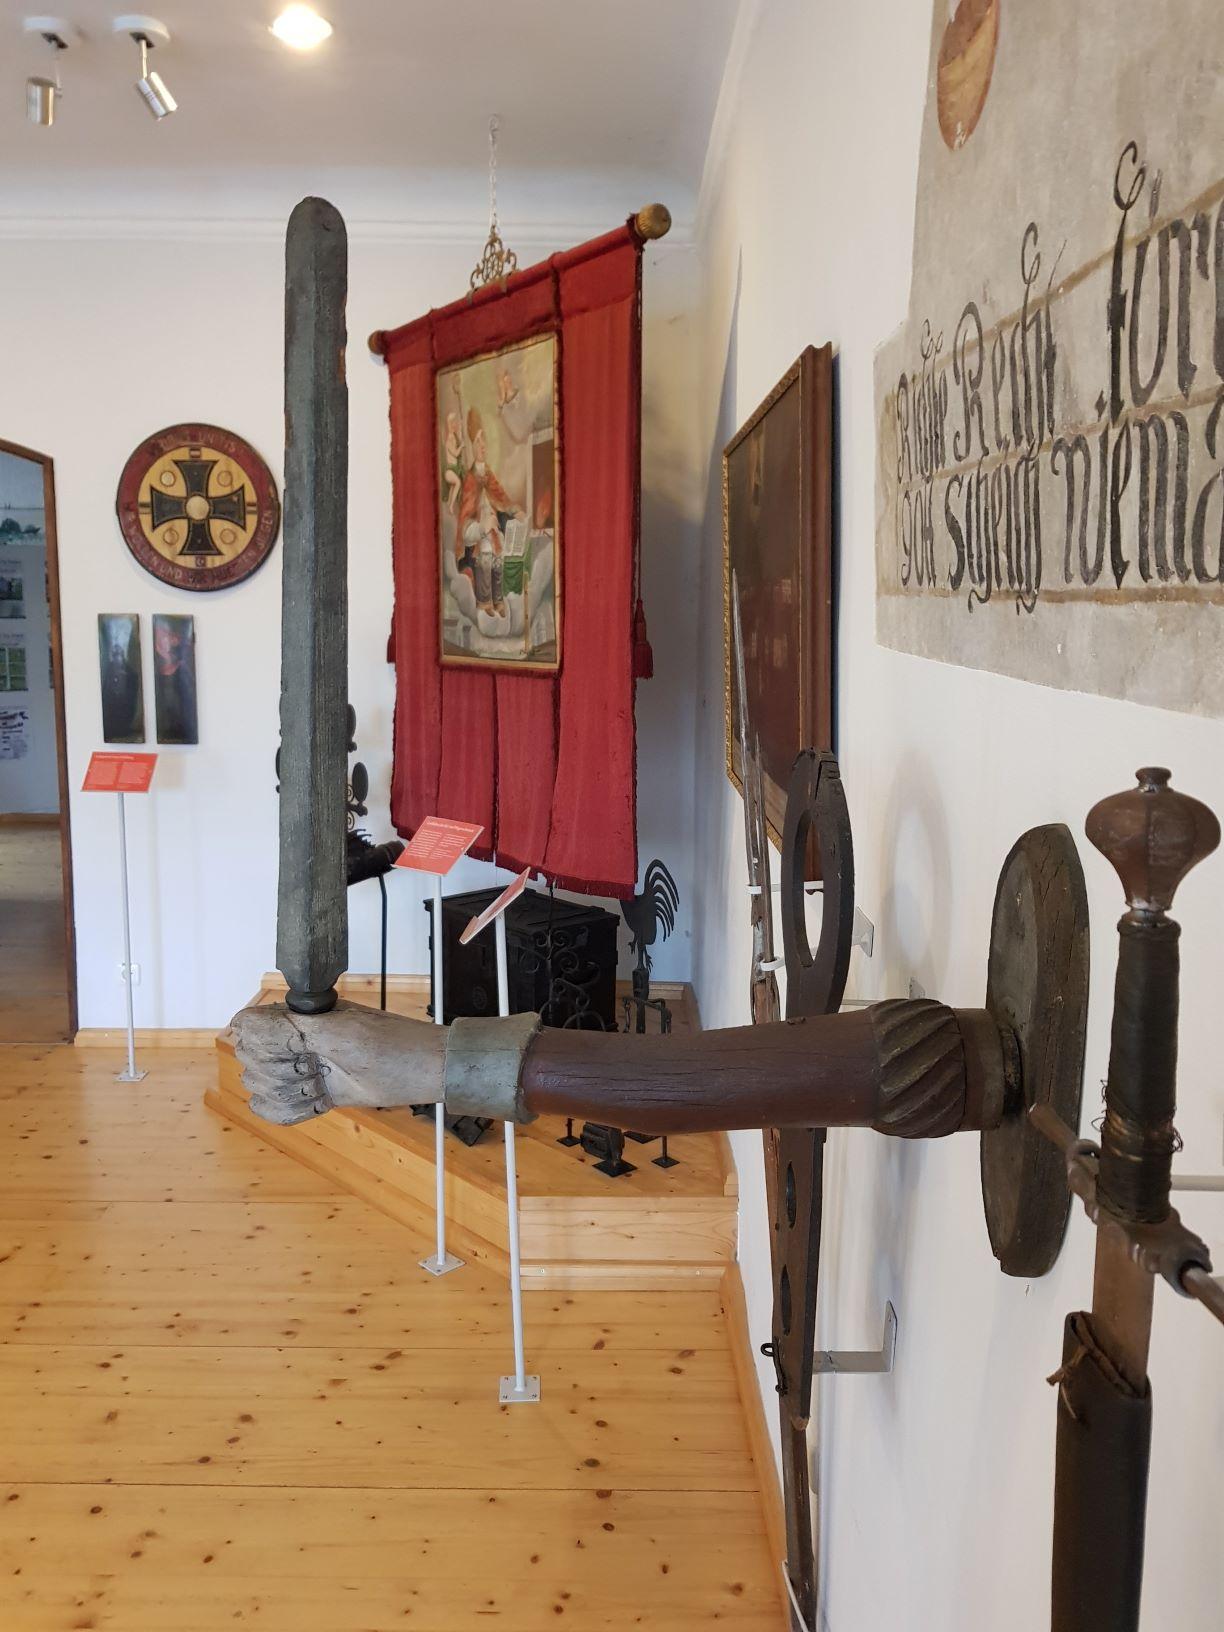 09 Freiungsarm Stadtmuseum 1